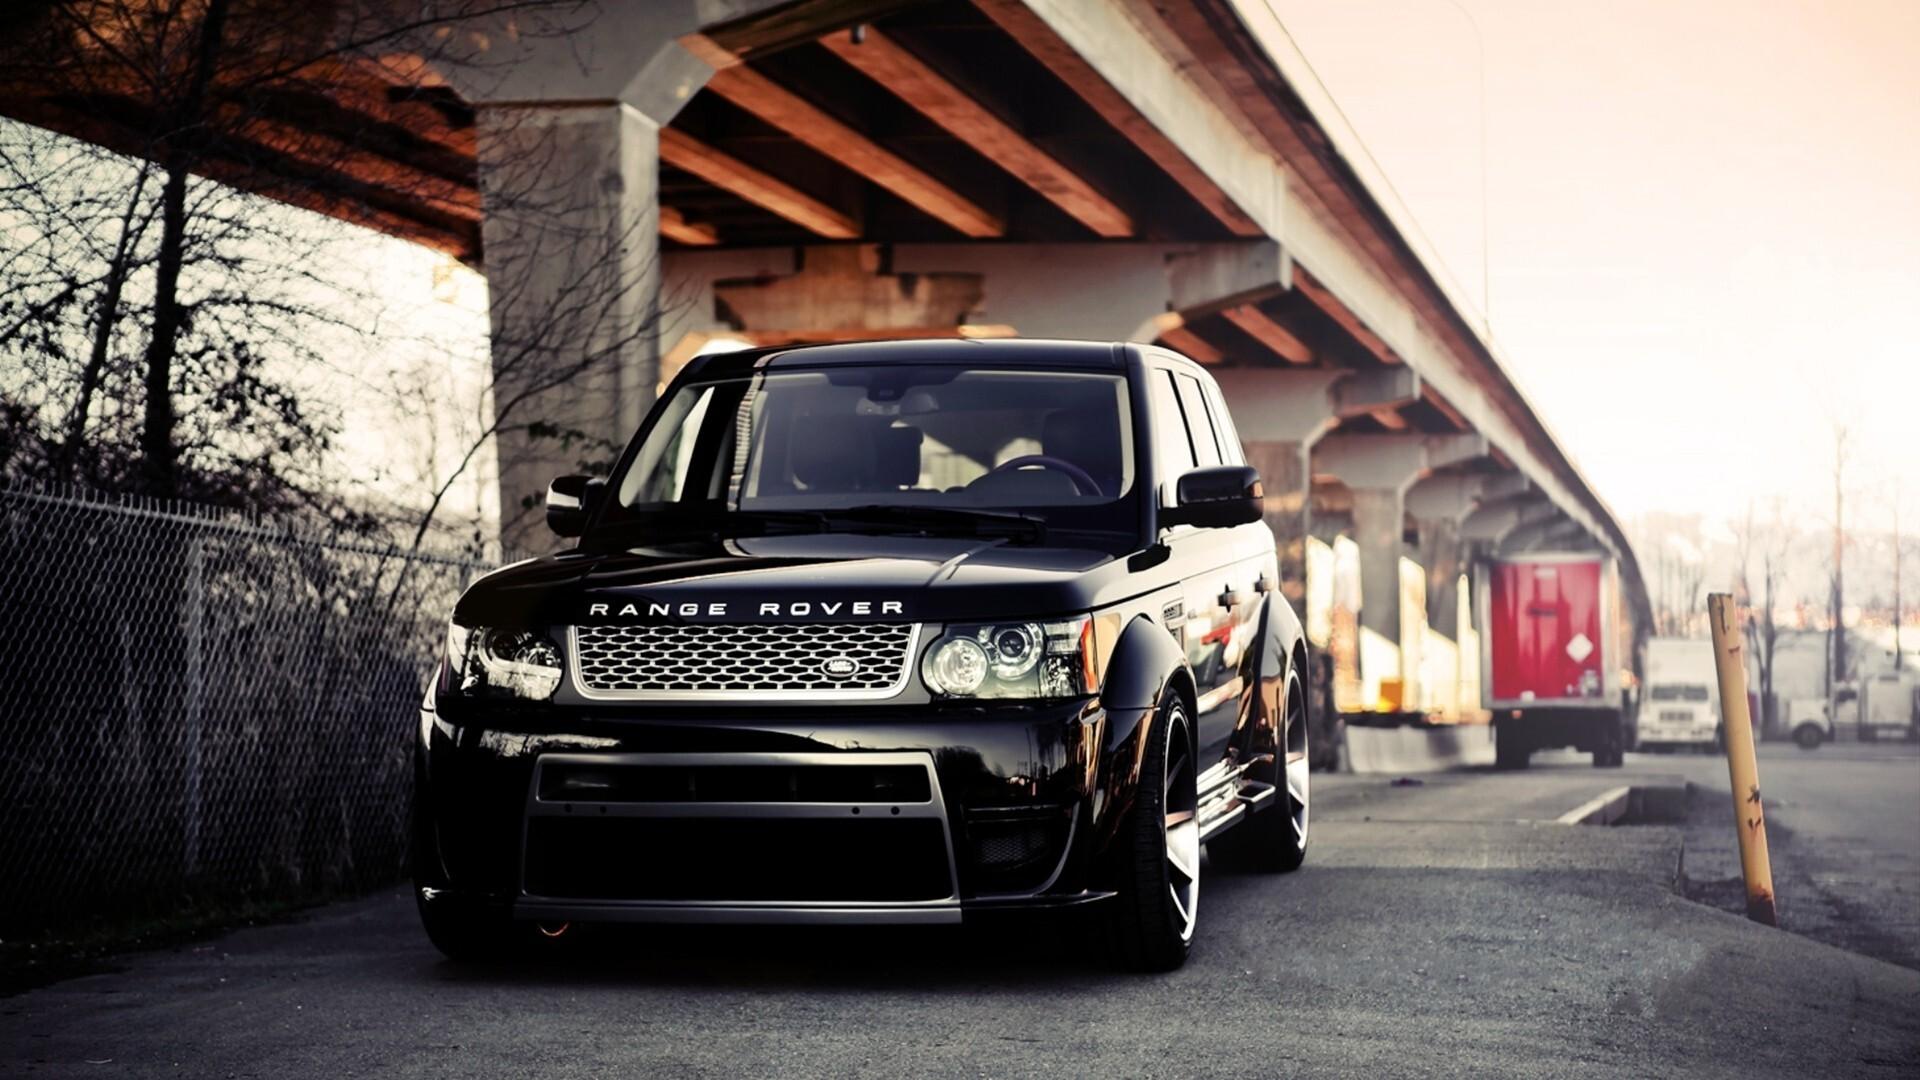 1920x1080 Range Rover Shining Black Laptop Full HD 1080P ...